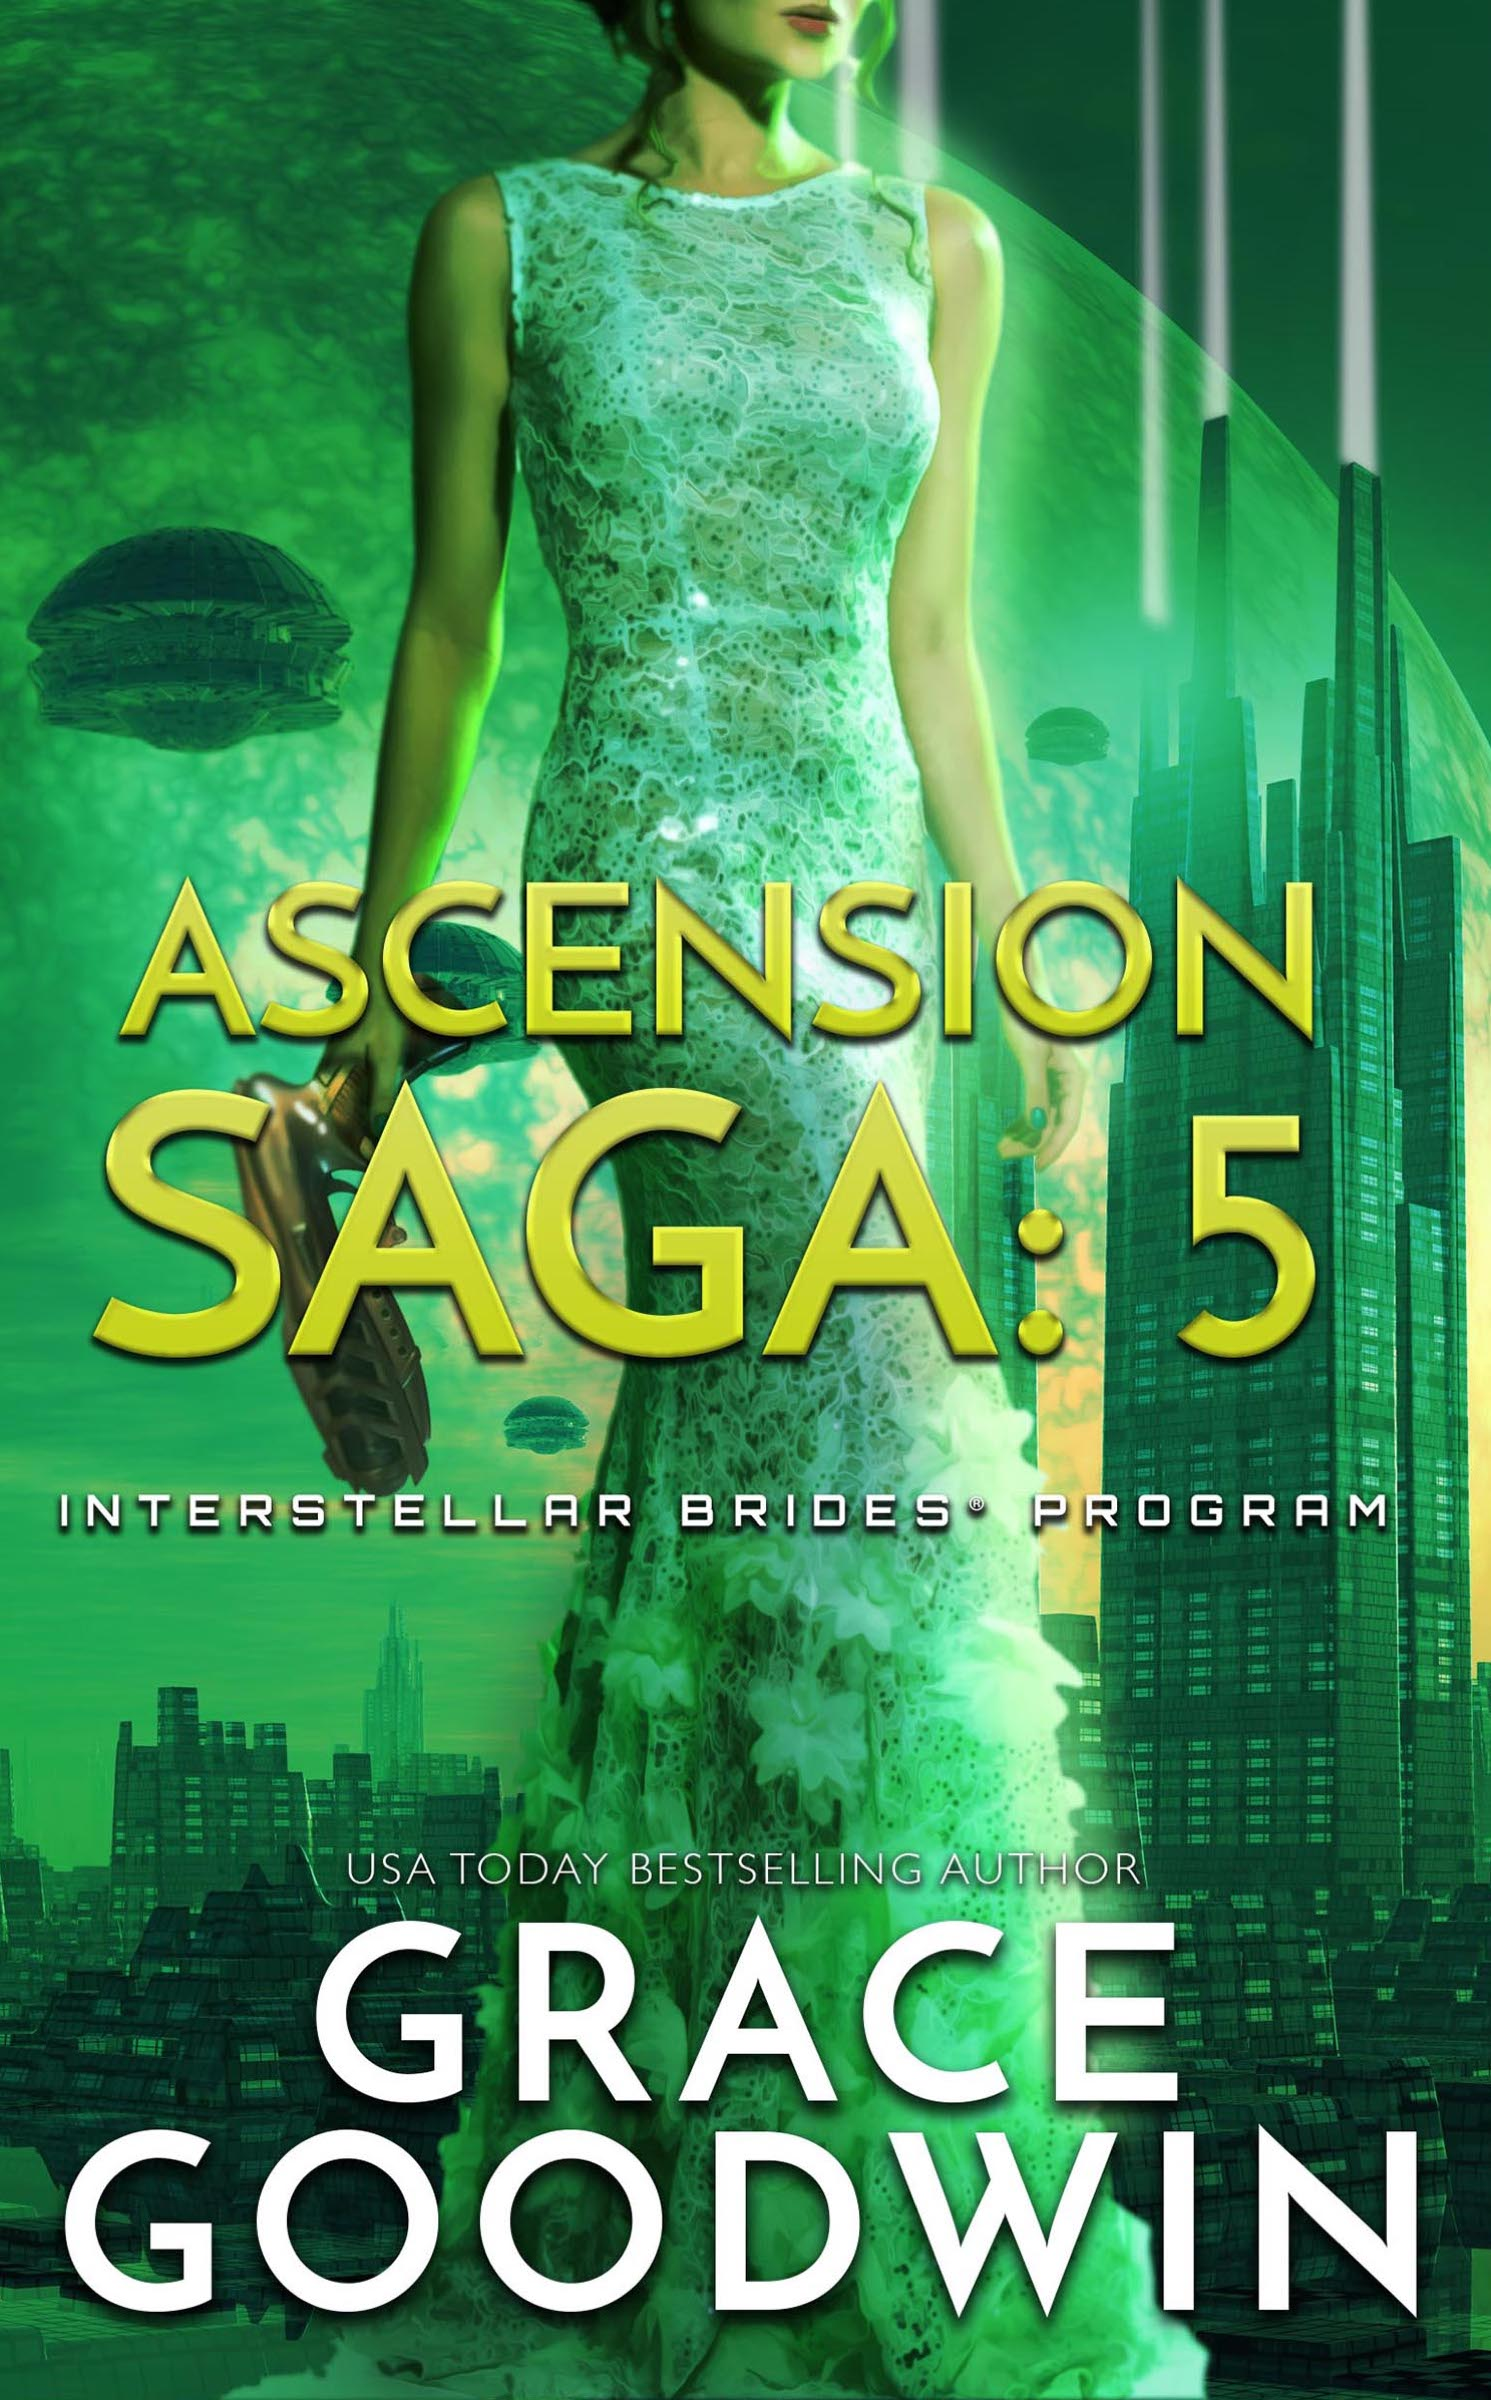 Faith; Part 2 (Interstellar Brides; Ascension Saga, #2 part 2 of 3)